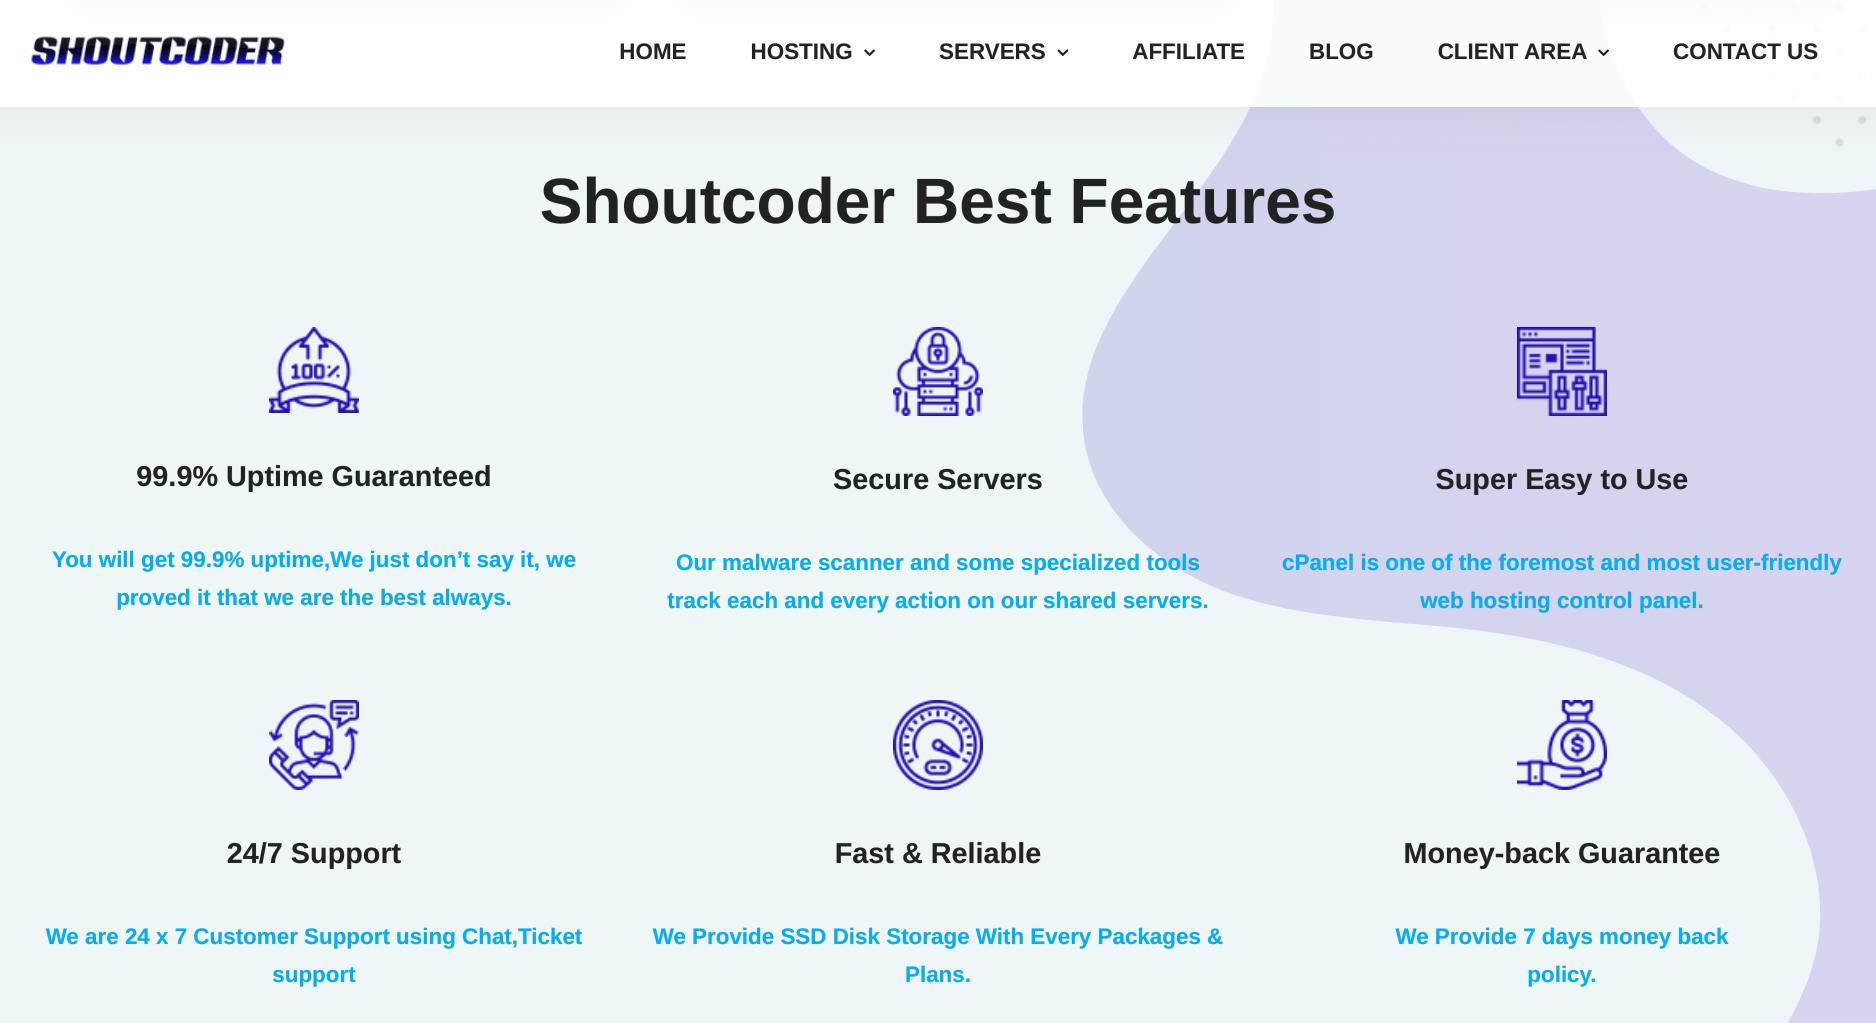 Shoutcoder